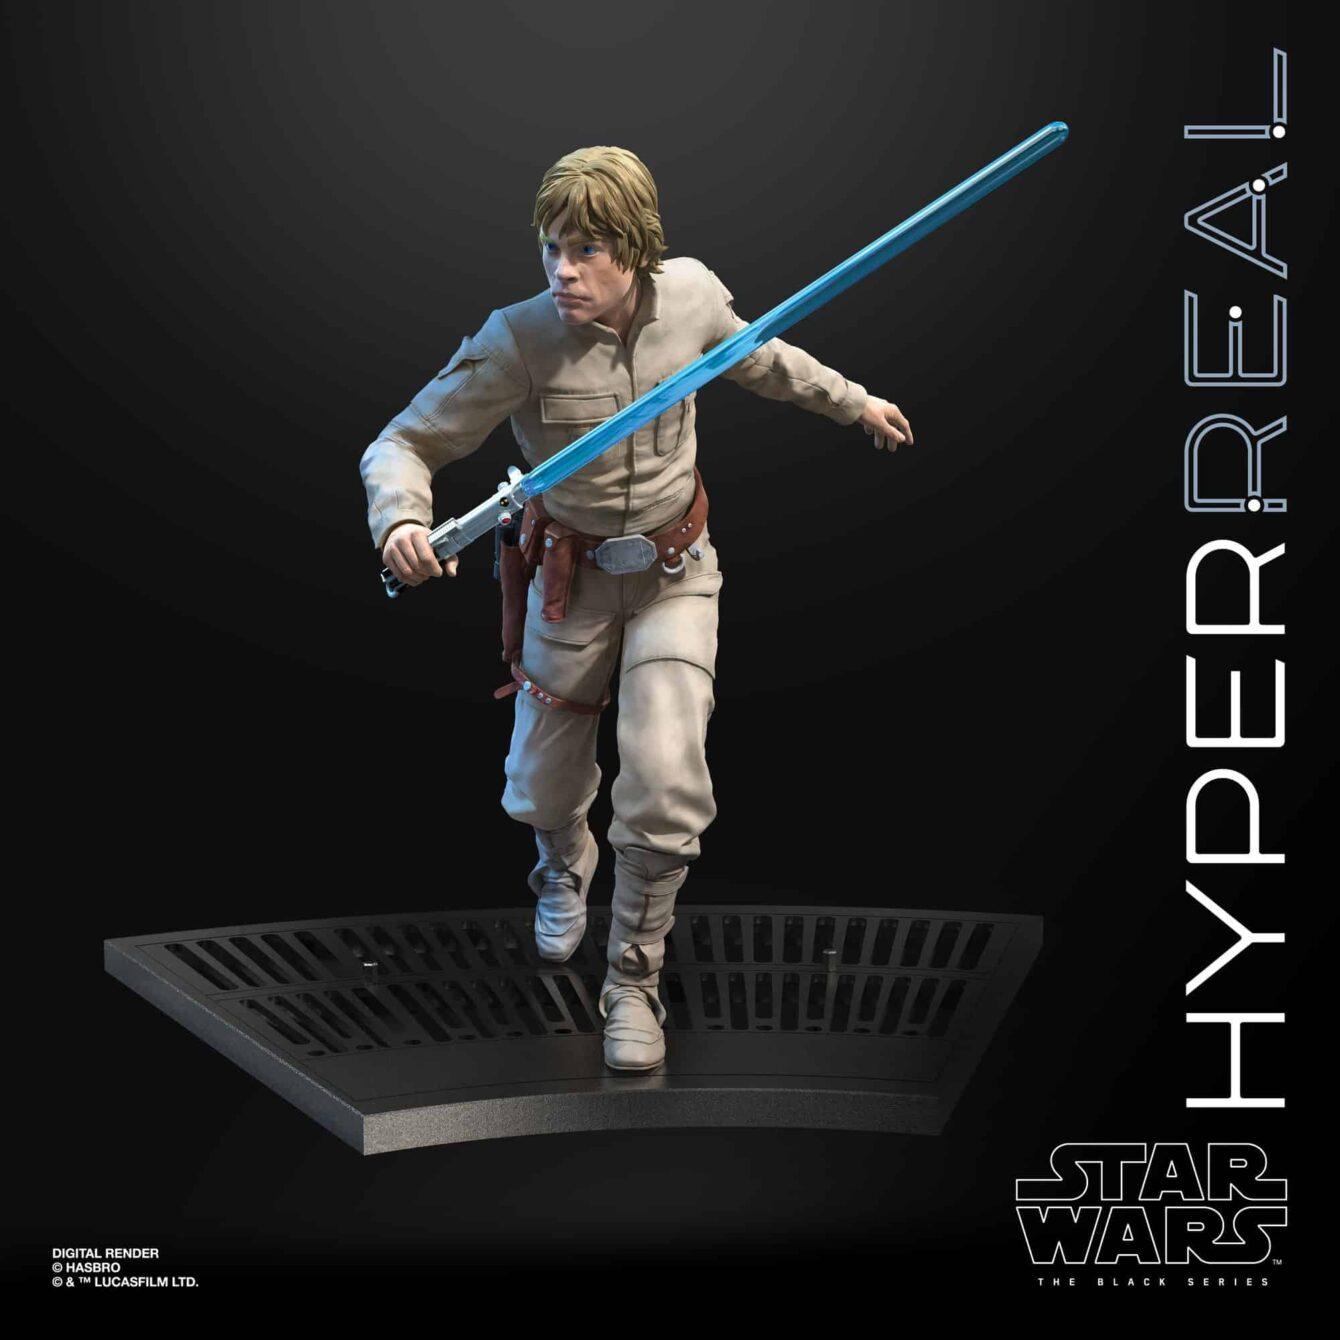 The Black Series Luke Skywalker Hyperreal 8-Inch Action Figure